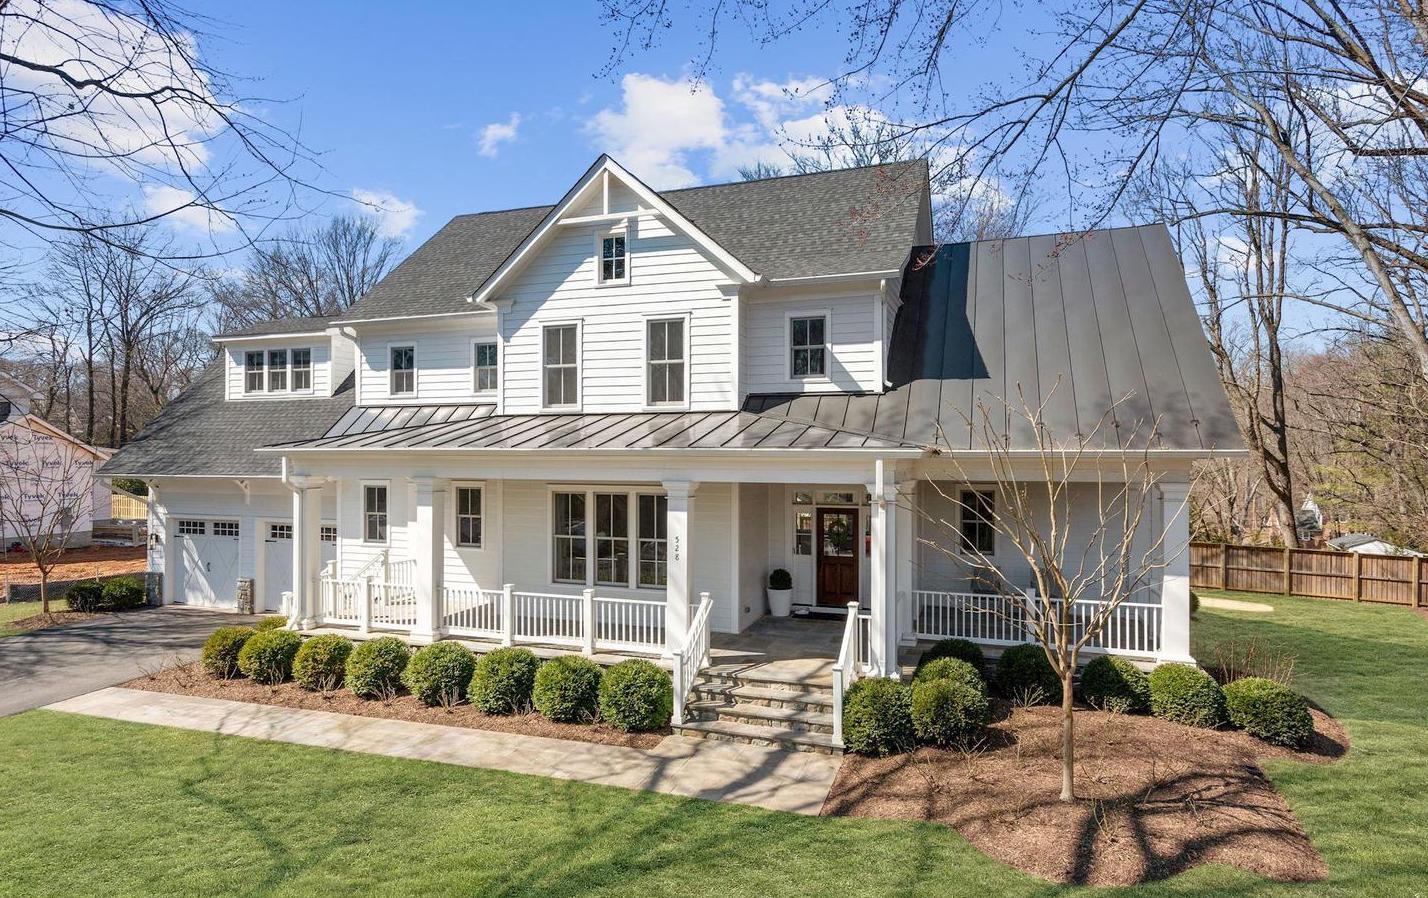 Vienna,VA Home Sales: Over $12.8M Jan -Jun 2021